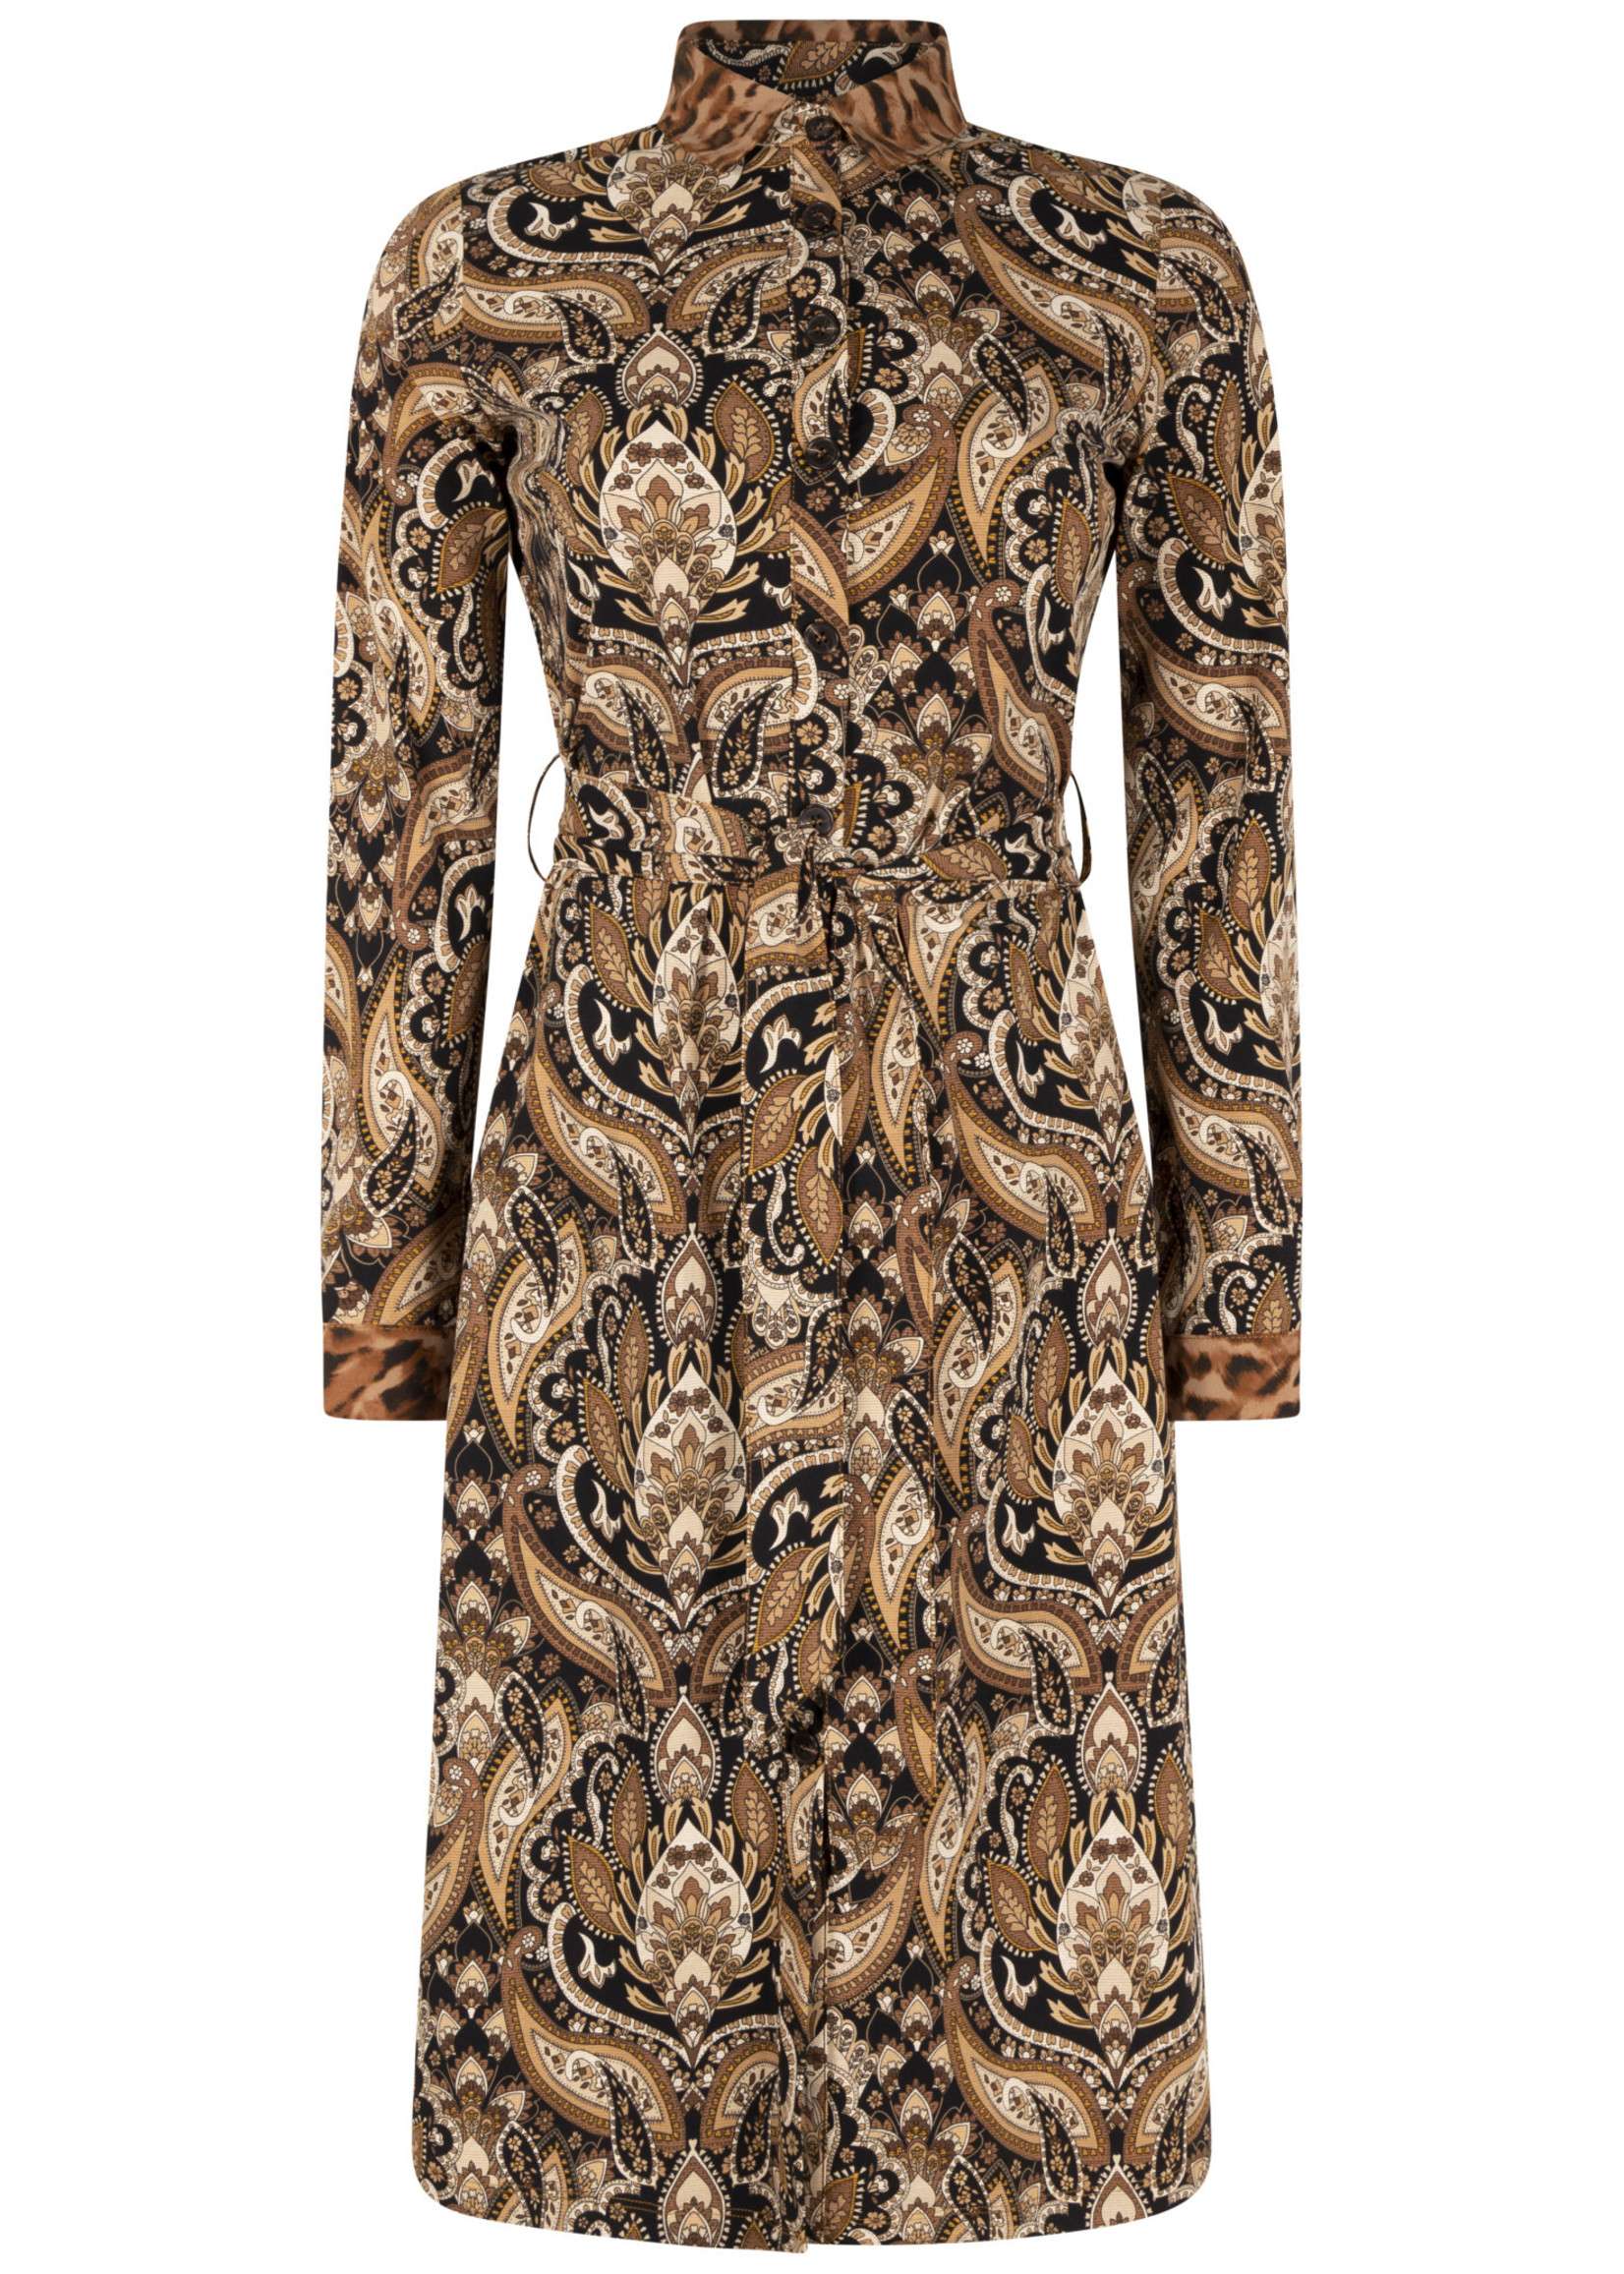 Tramontana Dress Travel Mirrored Orn. Prt. Mix